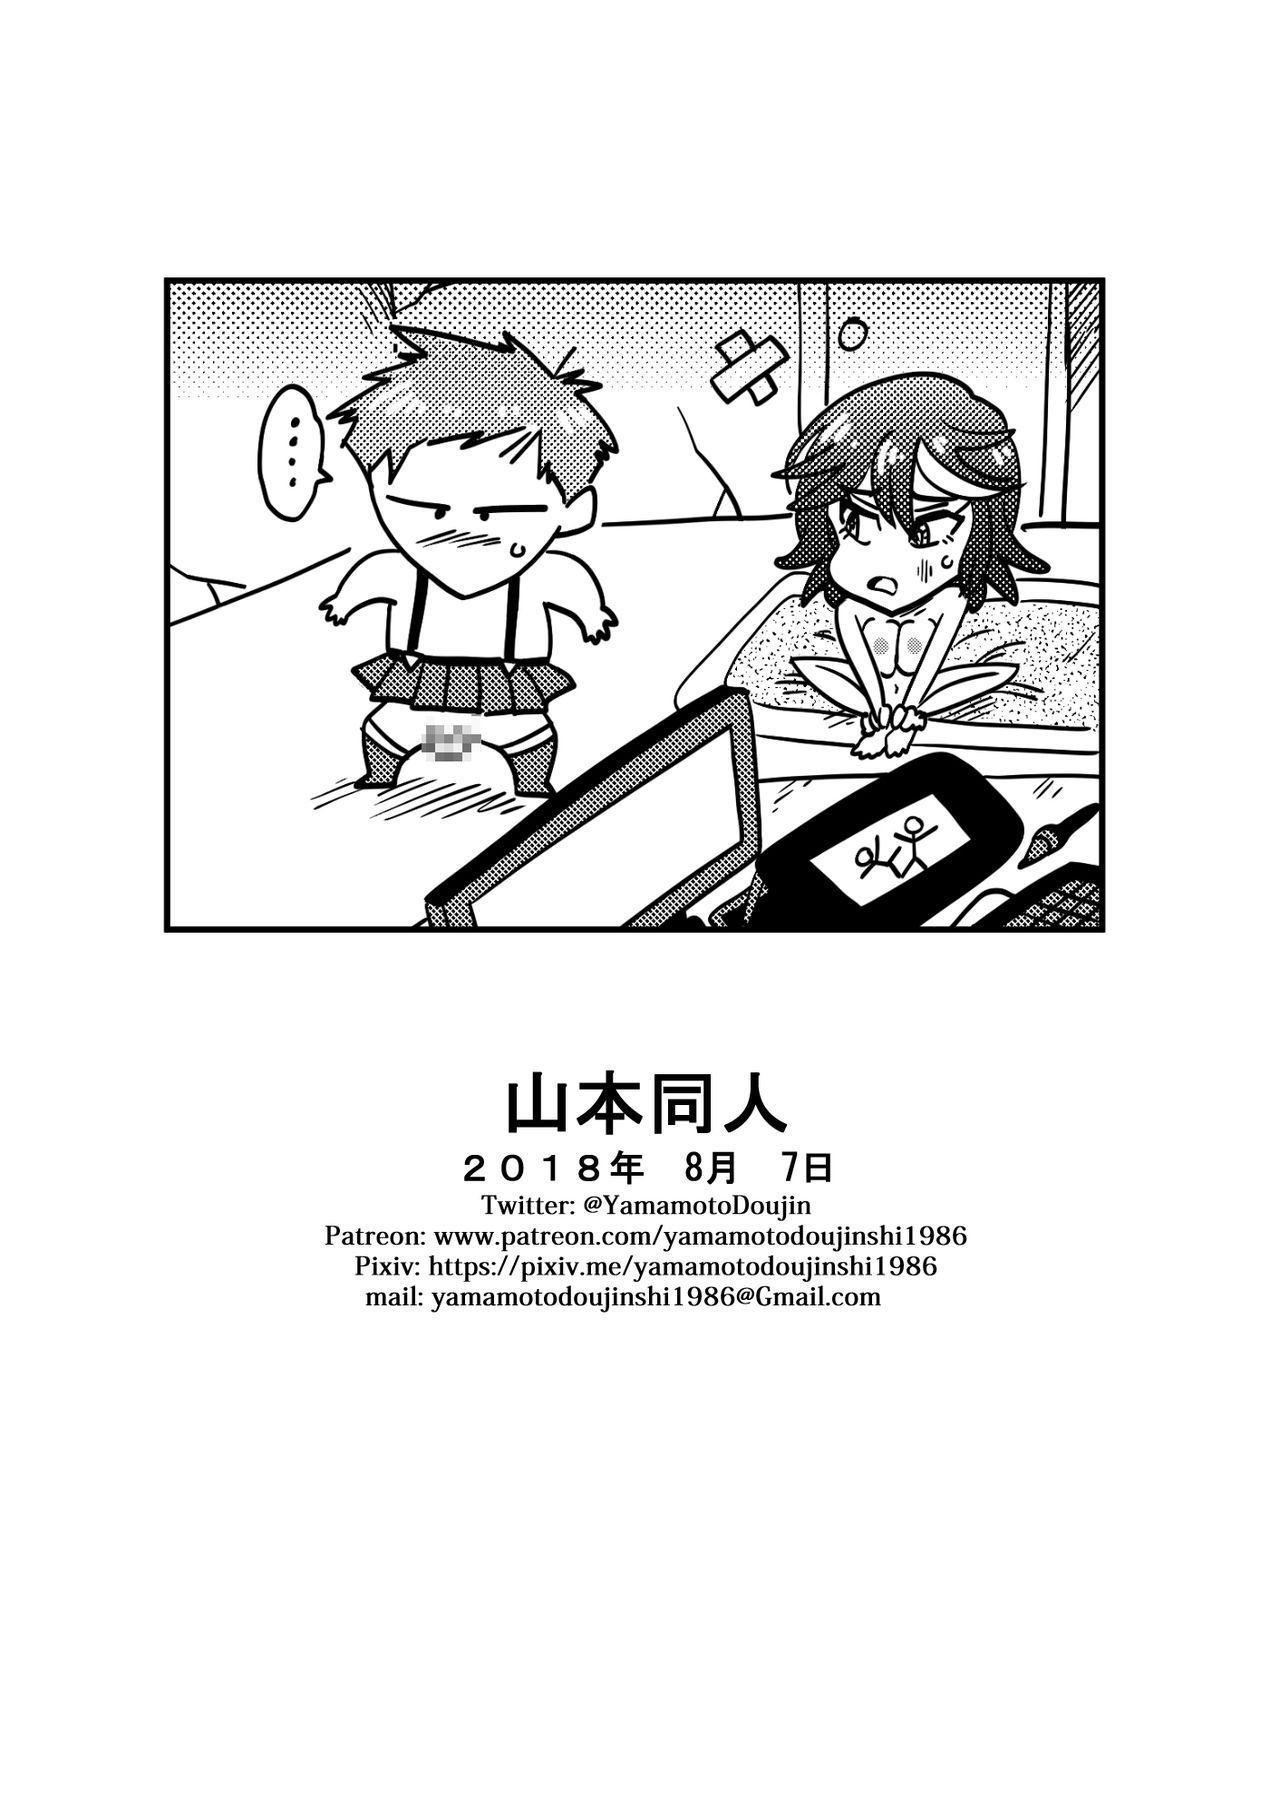 Kill la Kill Hentai: Ryuko perde à virgindade